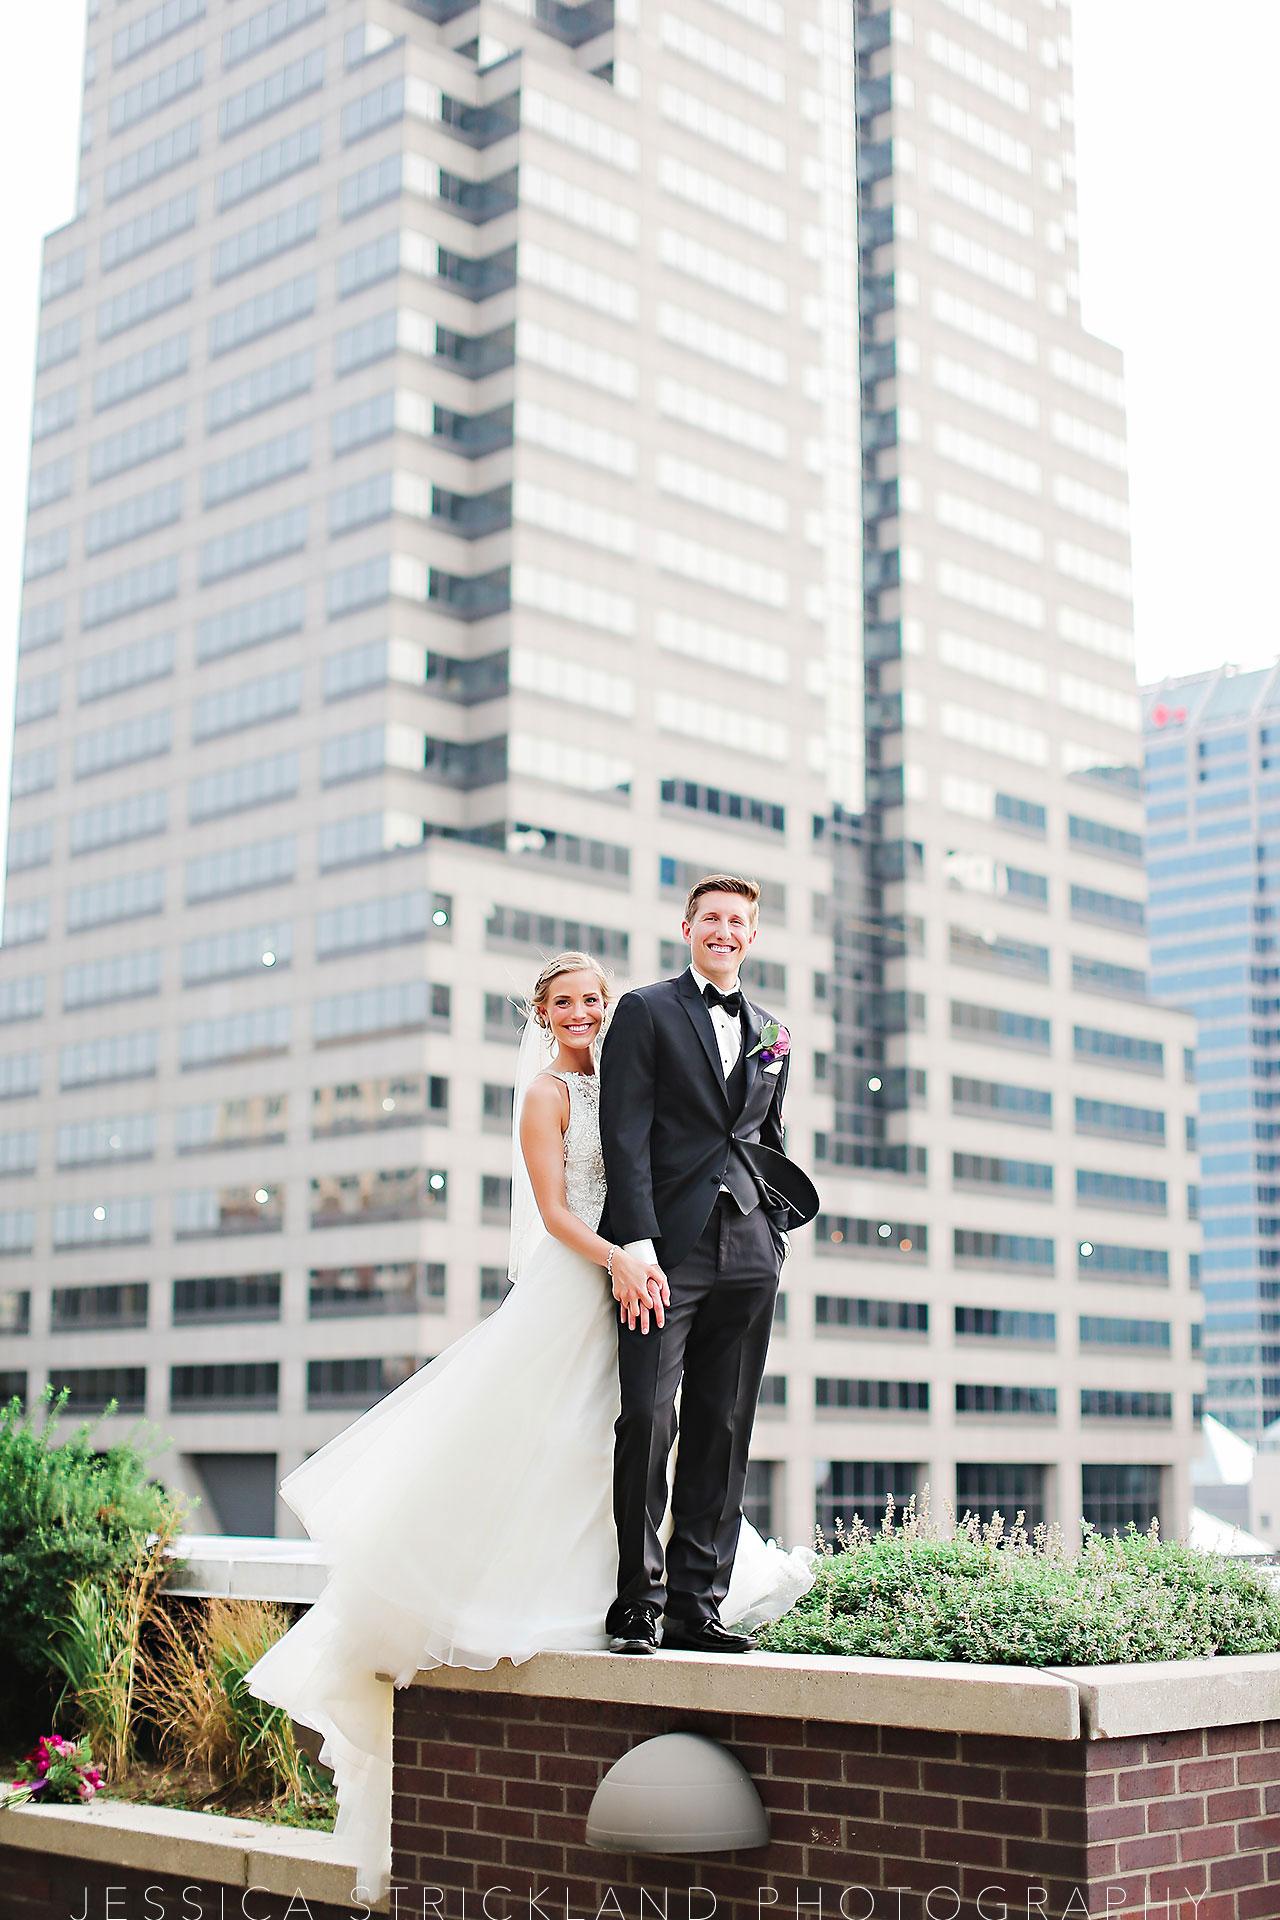 Serra Alex Regions Tower Indianapolis Wedding 233 watermarked